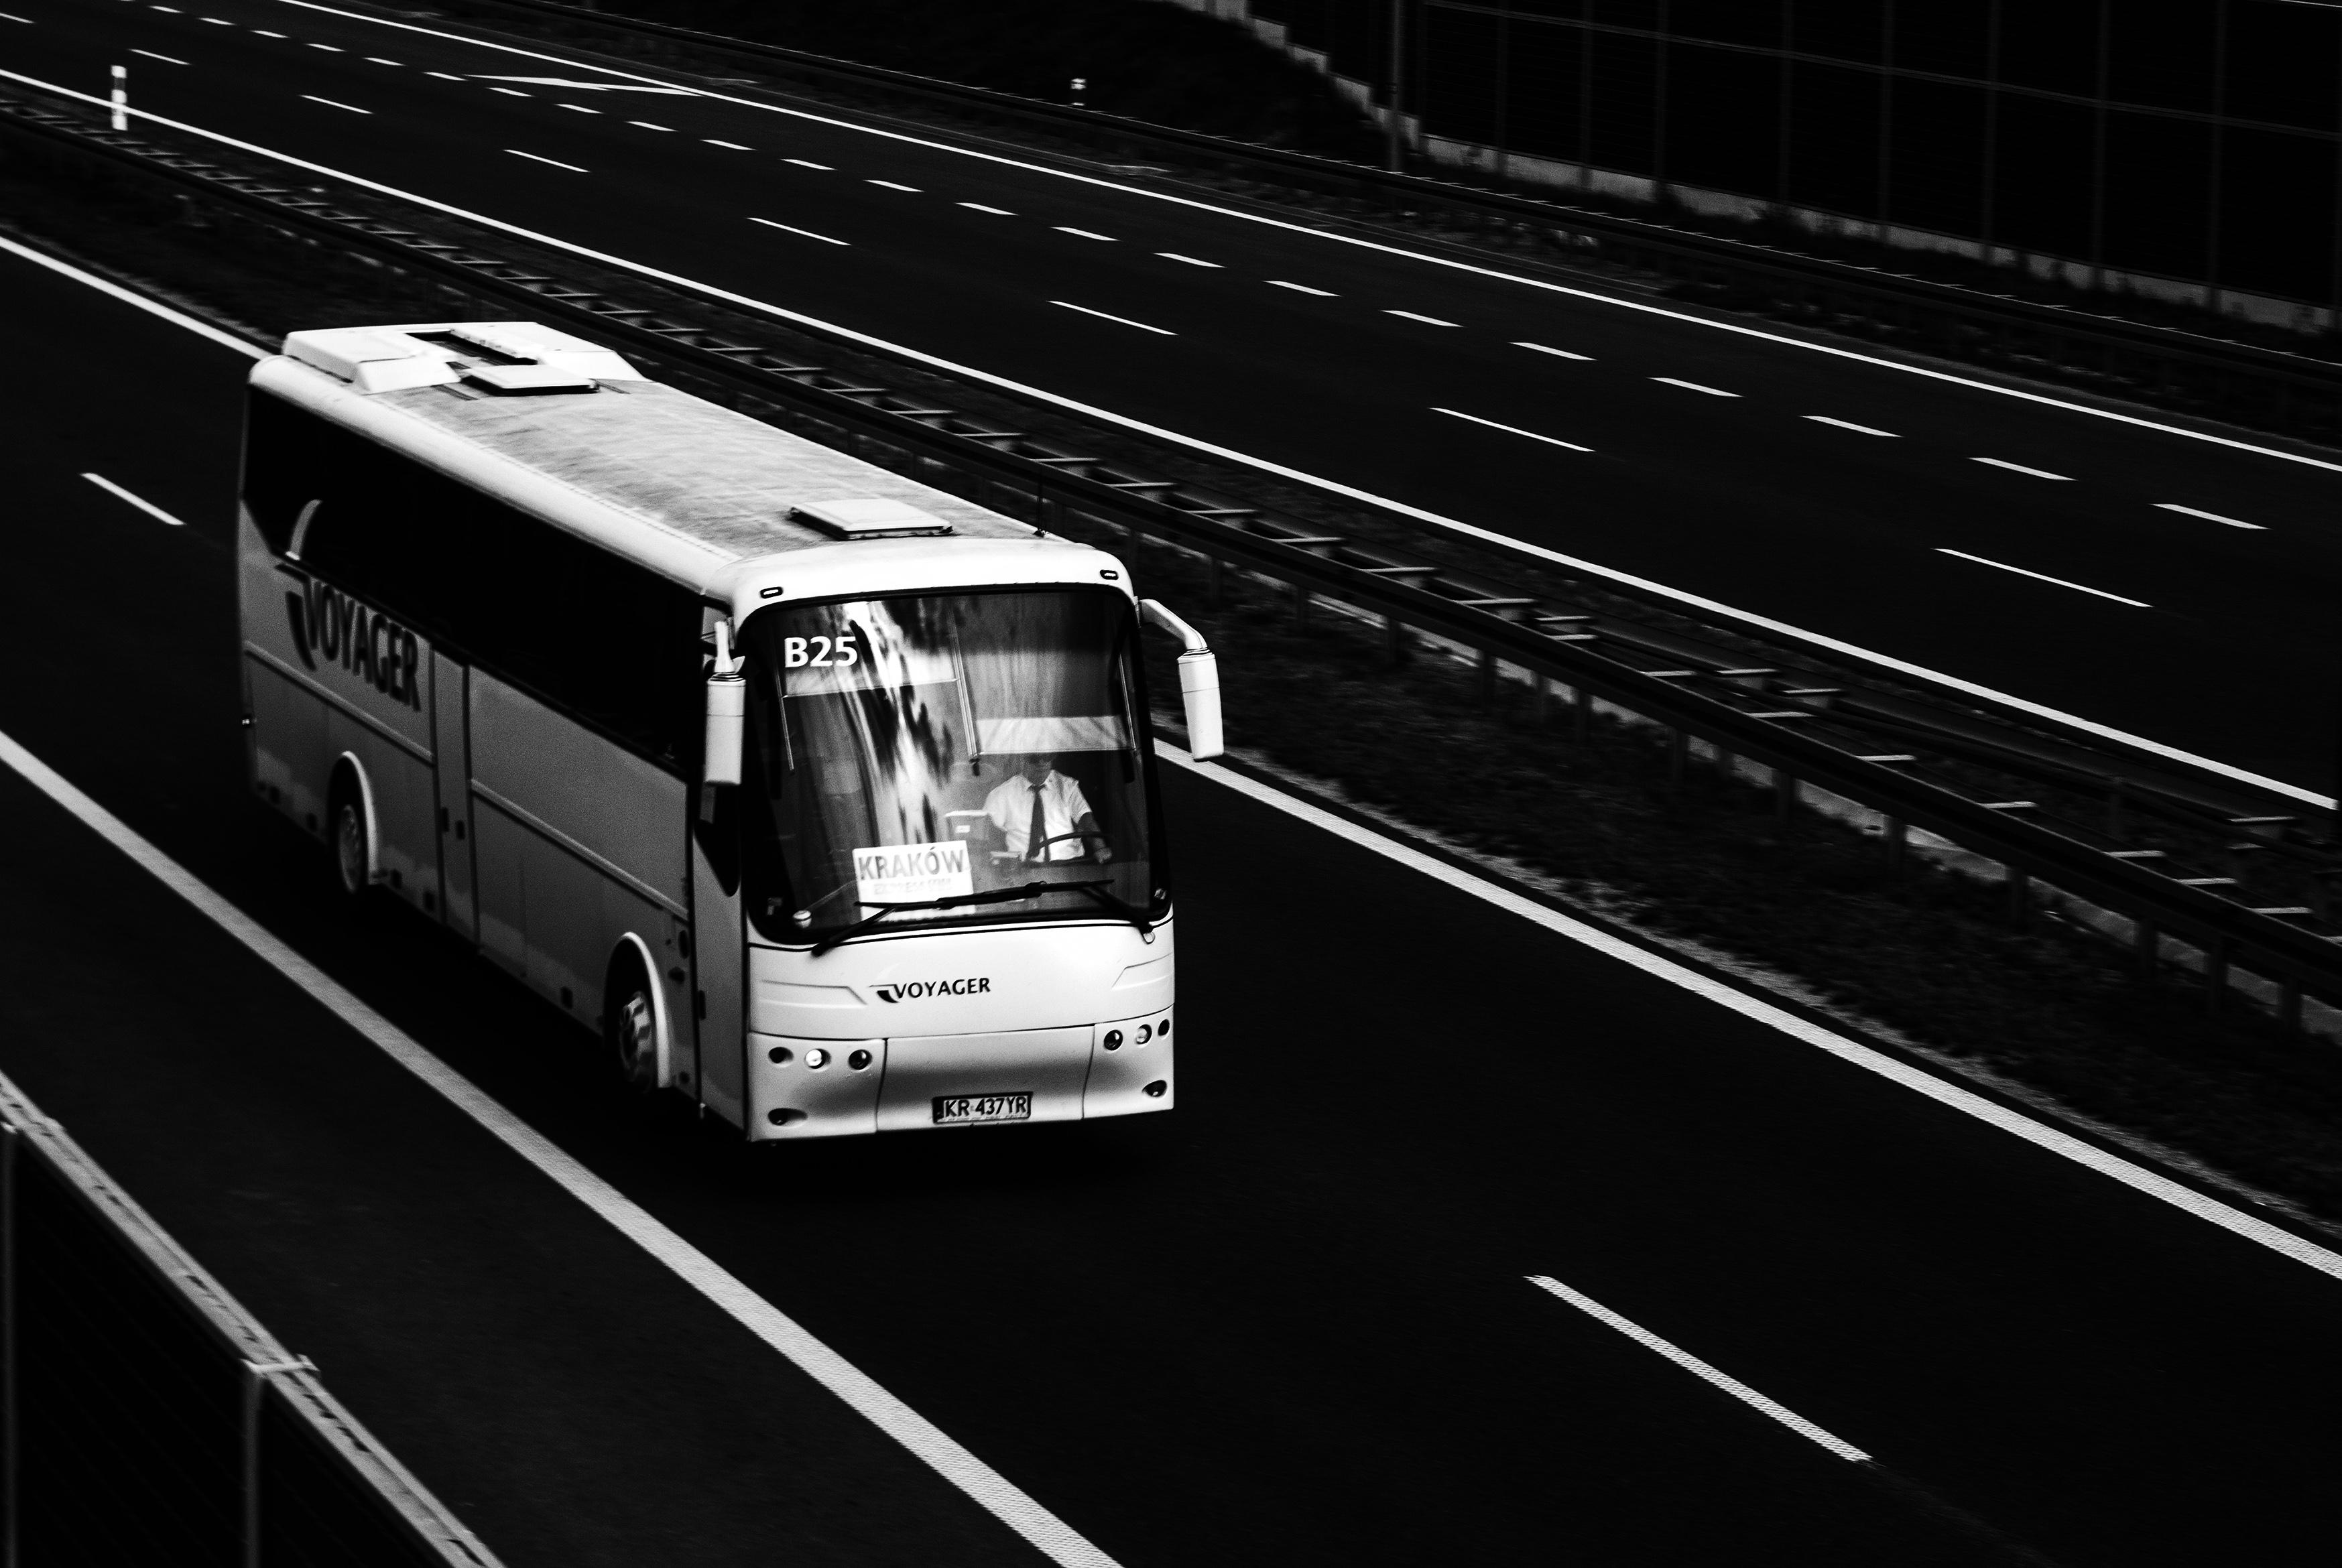 Coach Bova Futura, Bova, Bus, Coach, Futura, HQ Photo